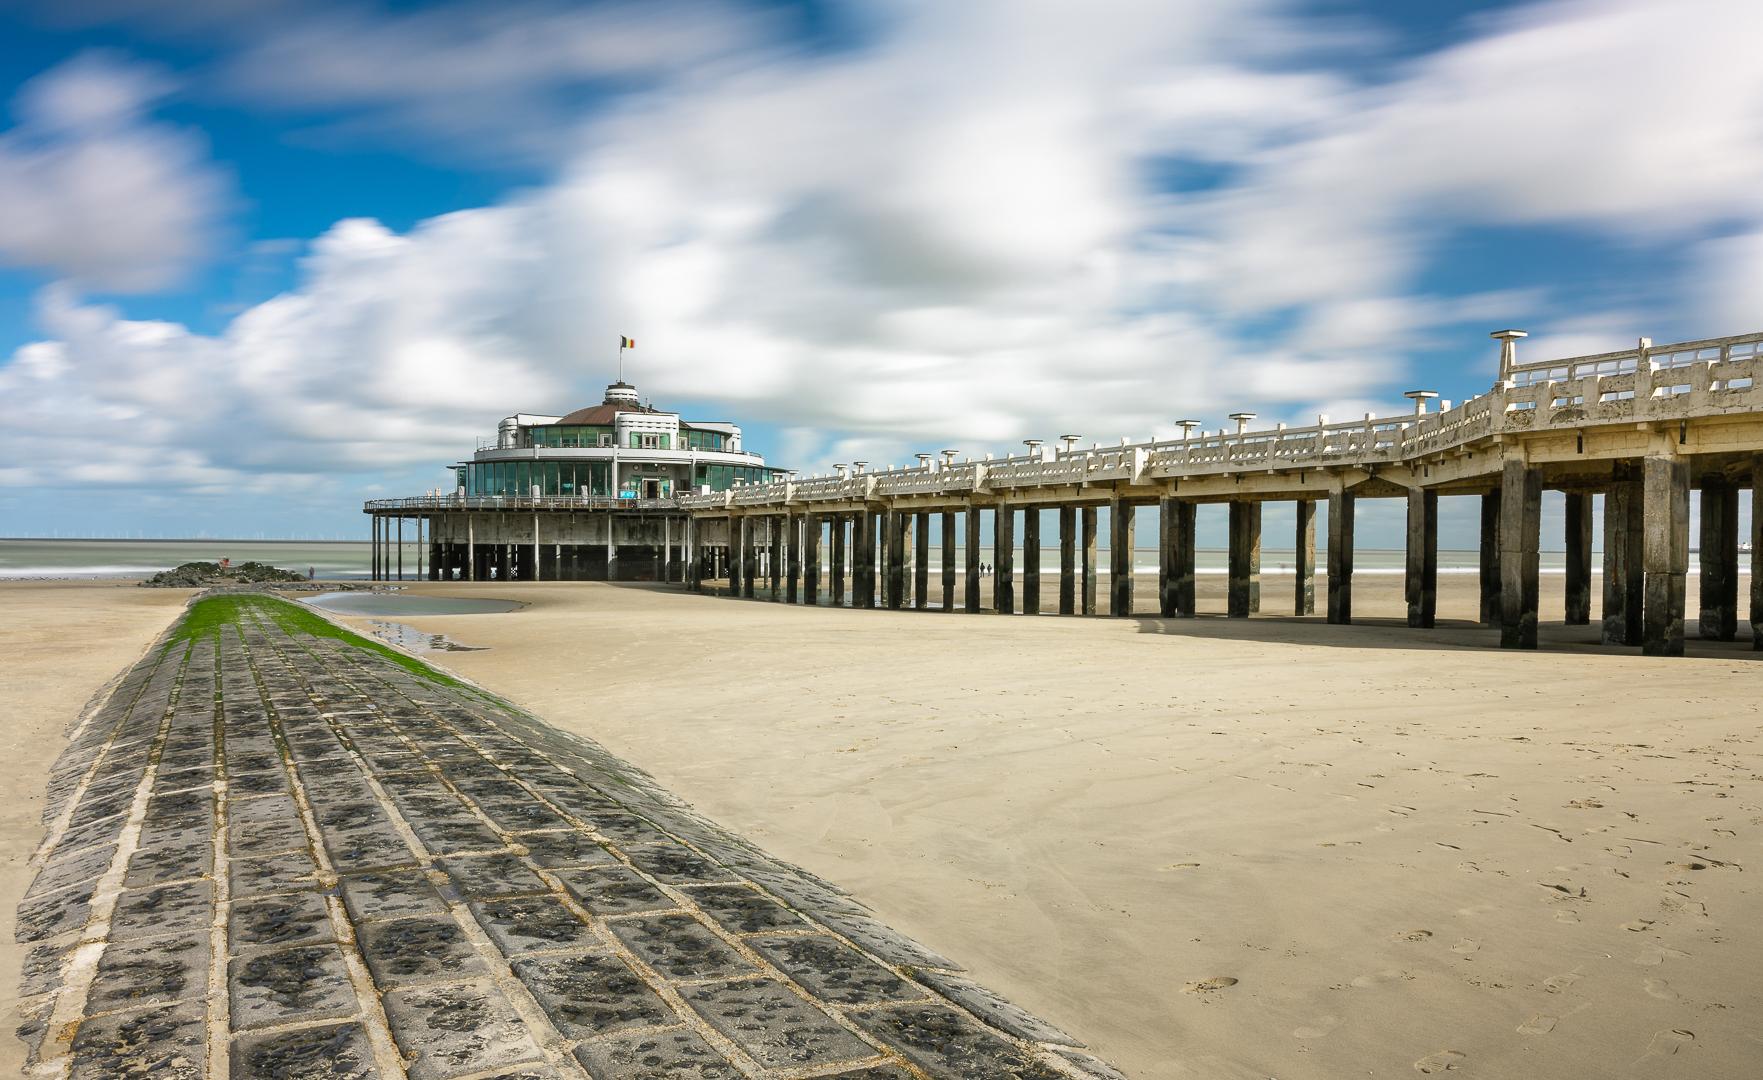 Blankenberg Pier, Belgium